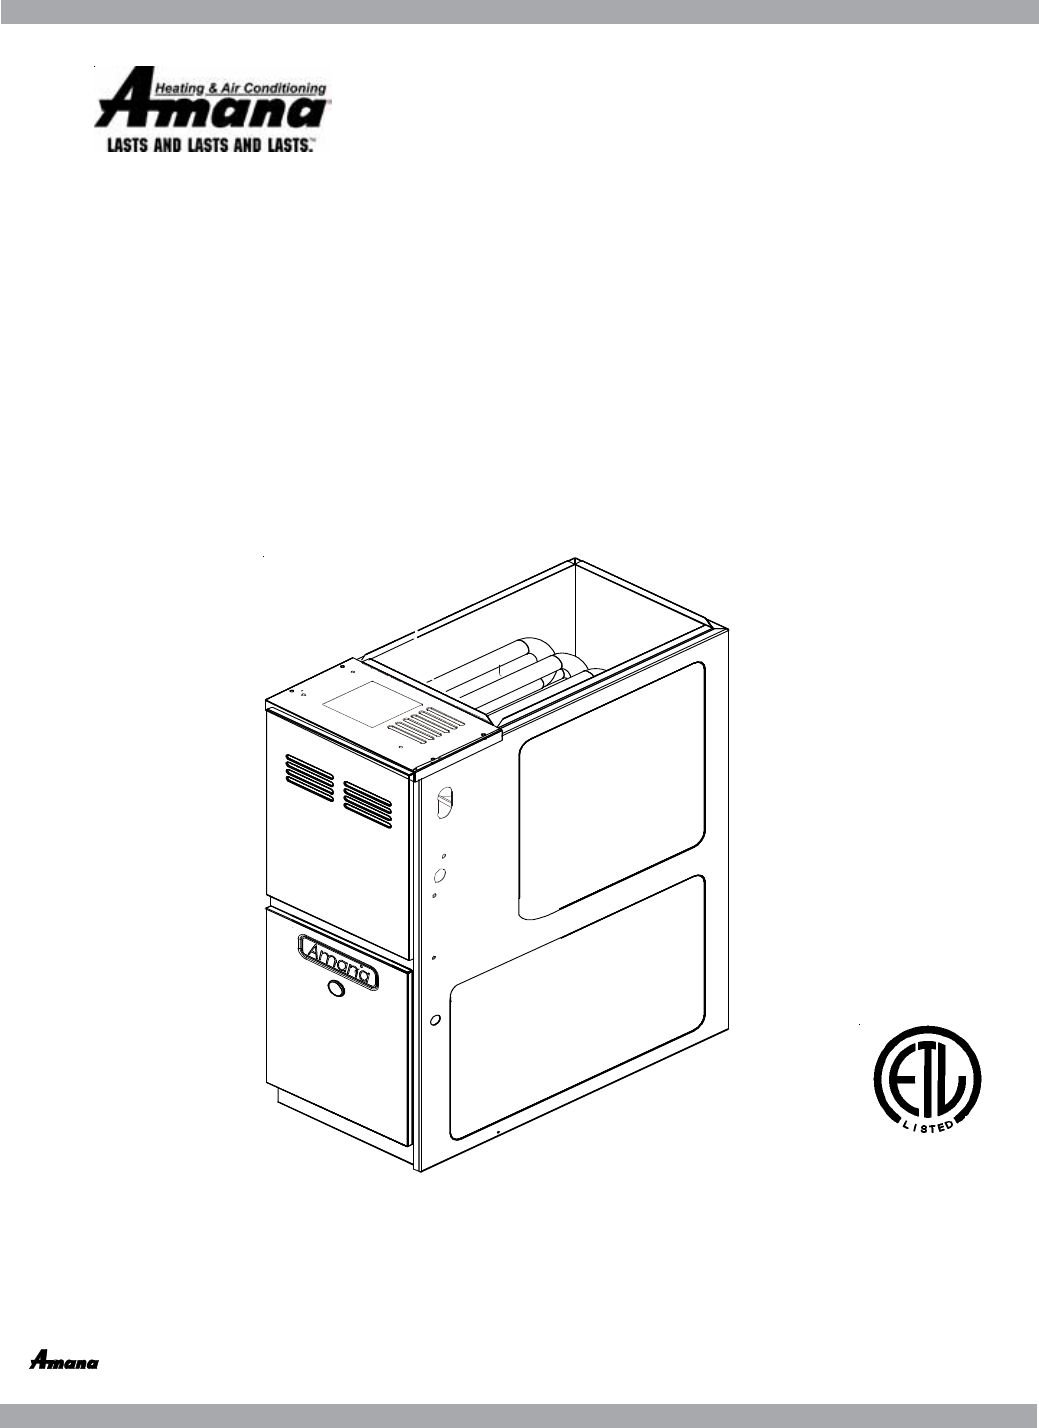 amana ac dual capacitor wiring diagram on ac motor capacitor, basic air  conditioning wiring diagram